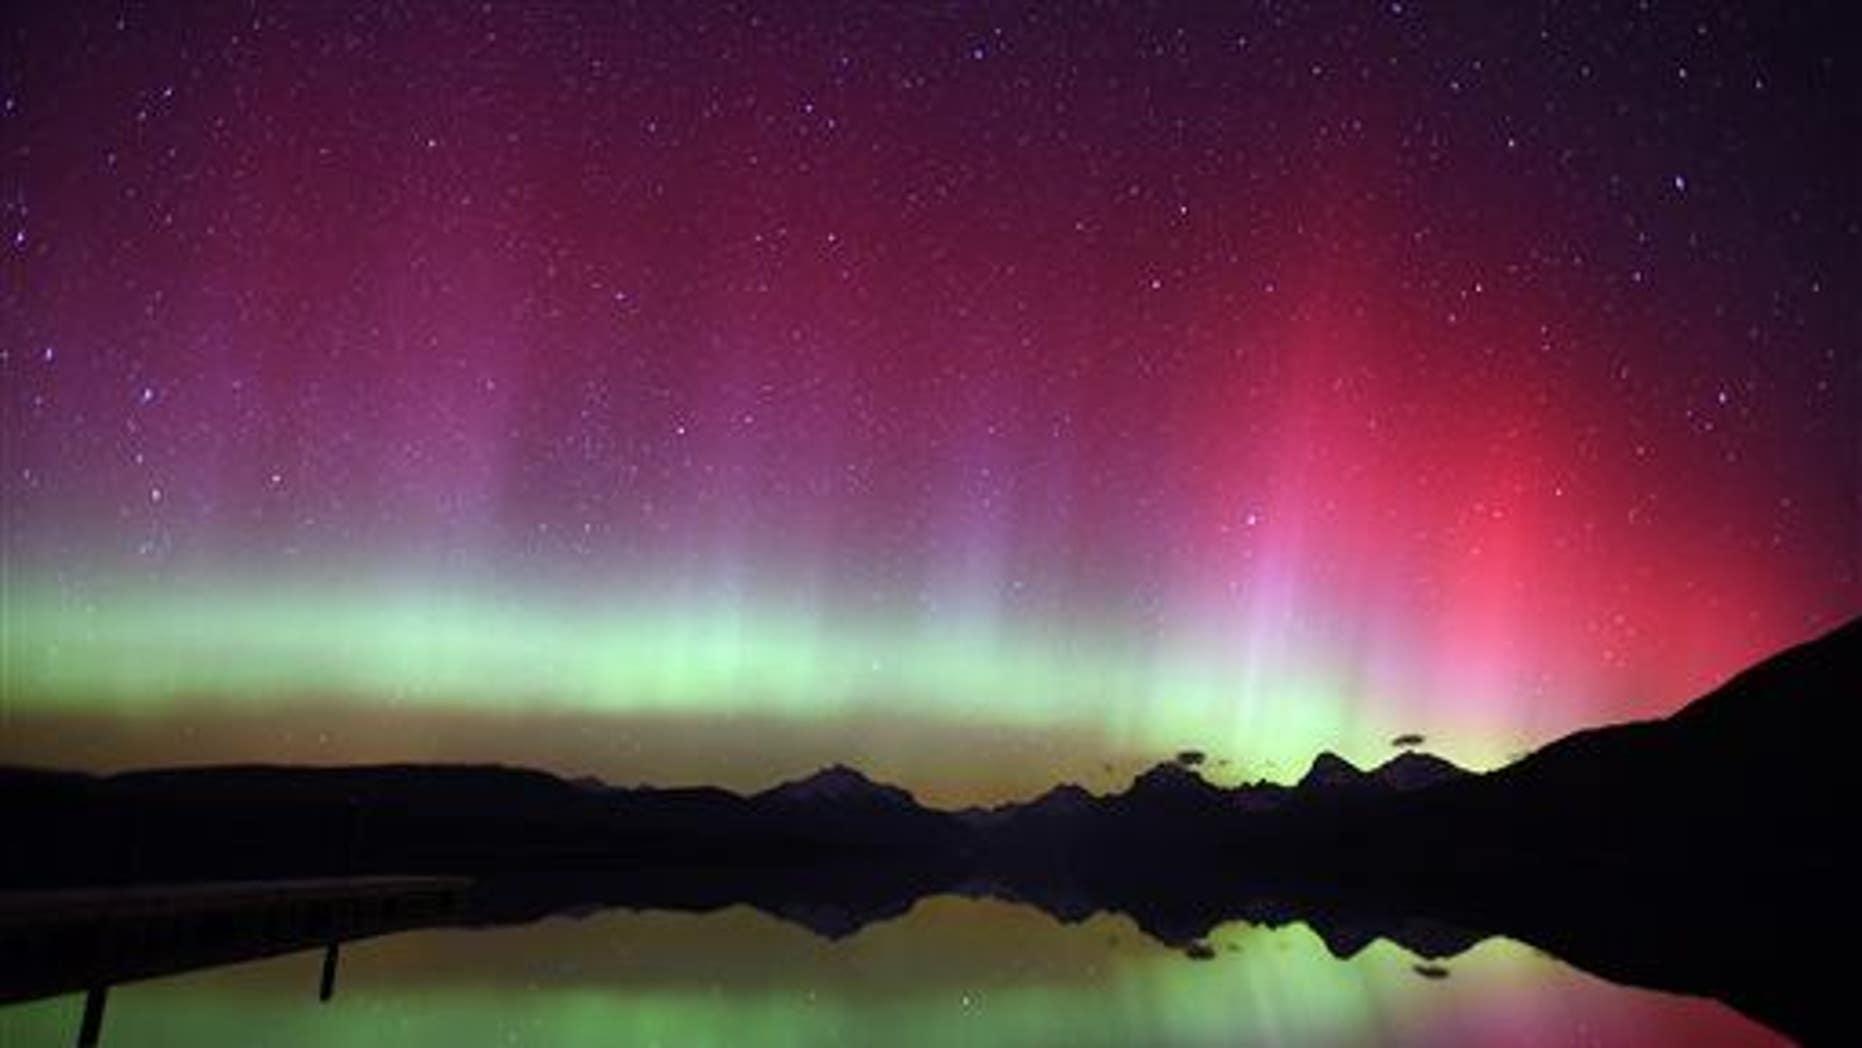 In this April 9, 2015, photo, an aurora borealis illuminates the night sky over Lake McDonald in Glacier National Park, Mont.